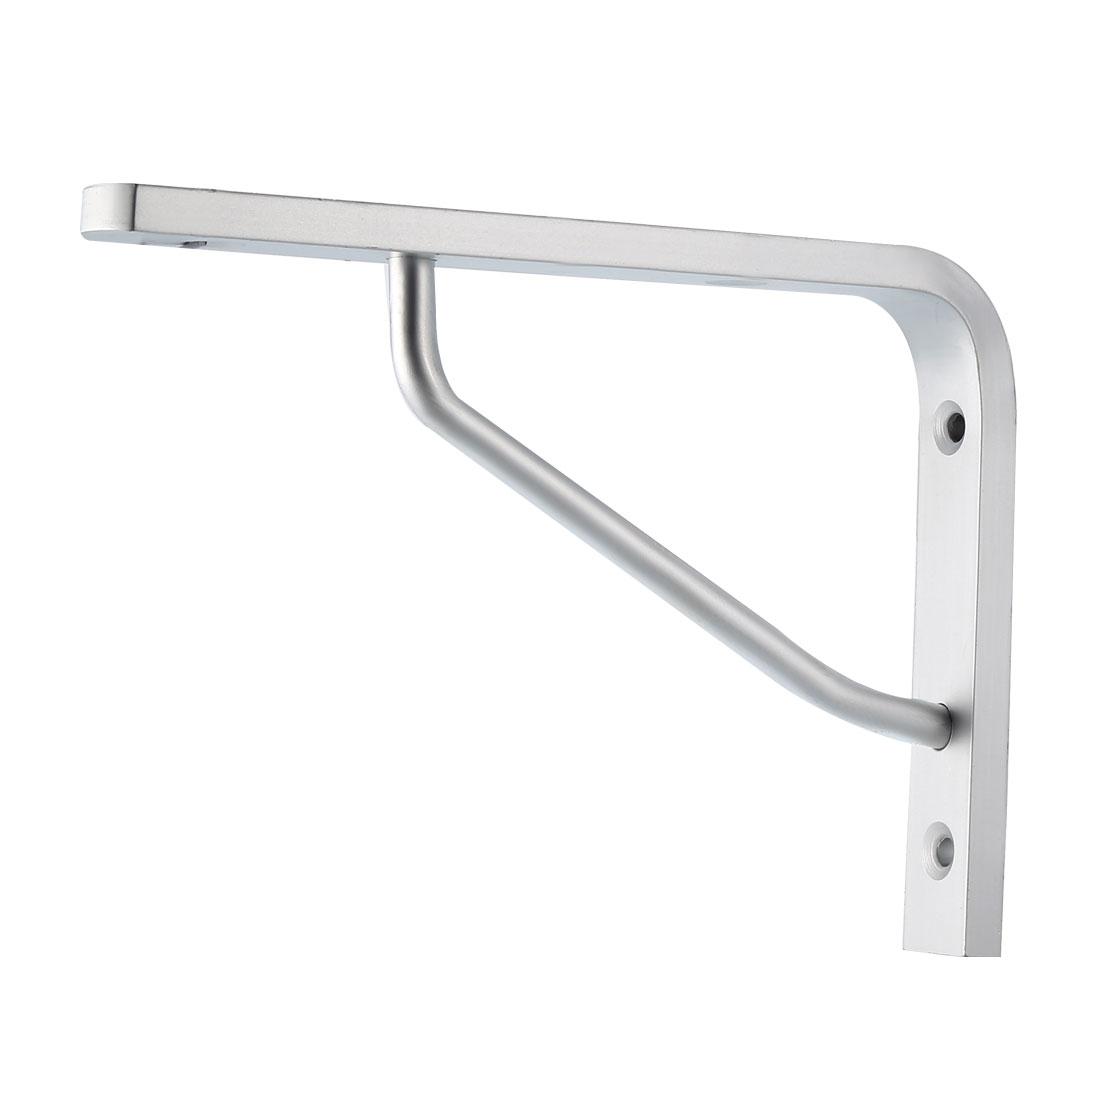 "Shelf Bracket, 7""L x 5""H x 0.4""T Right Angle Bracket Aluminum Alloy"